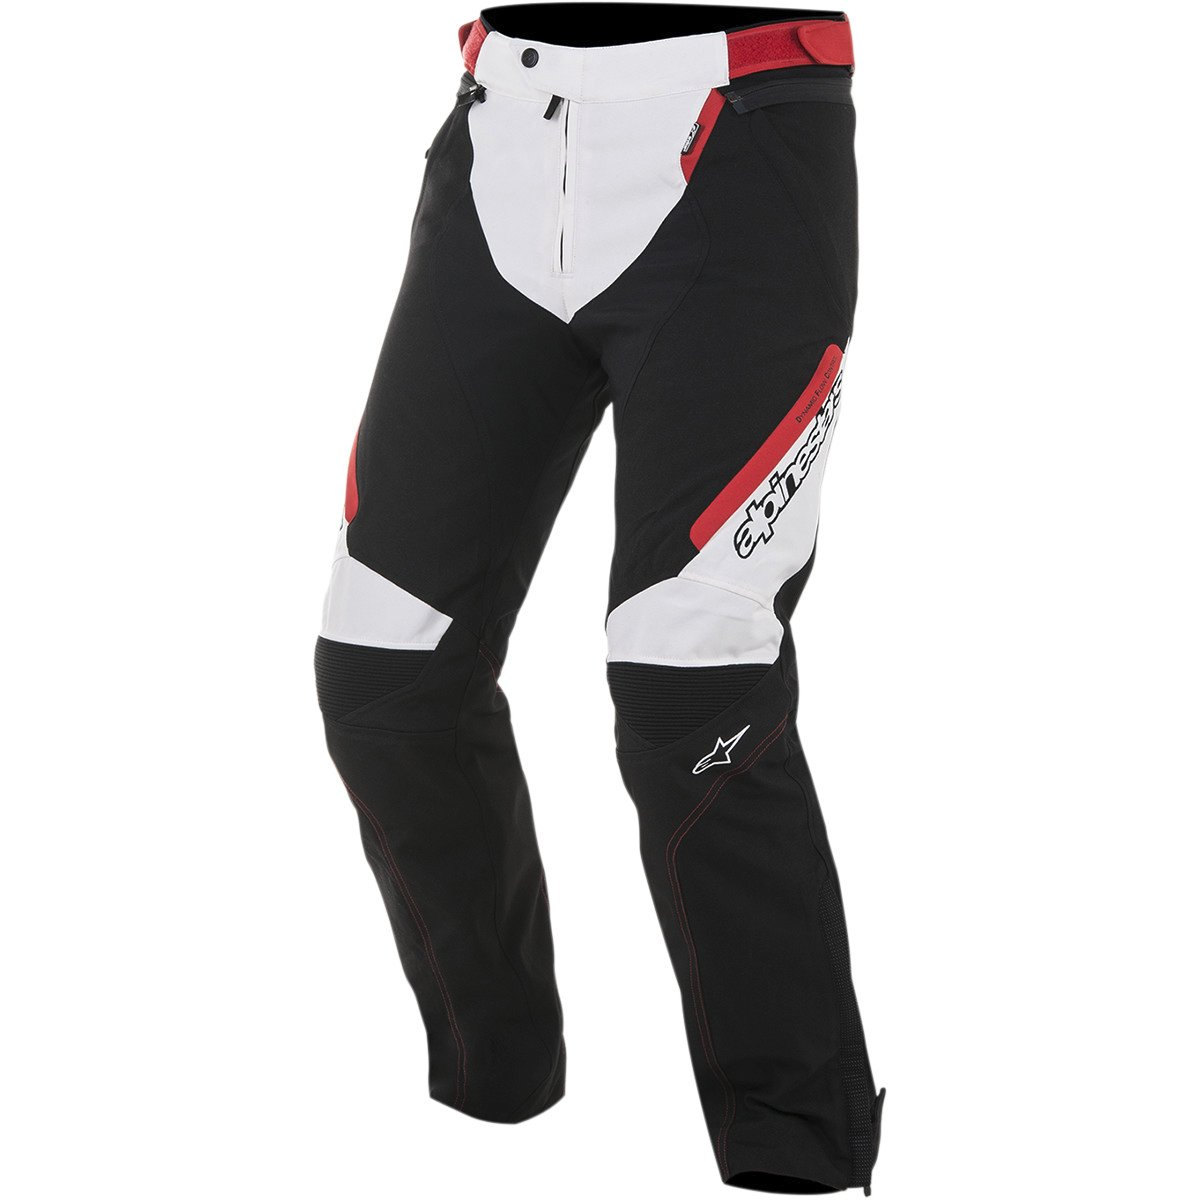 Alpinestars Raider Drystar Men's Sports Bike Motorcycle Pants - Black/White/Red / X-Large